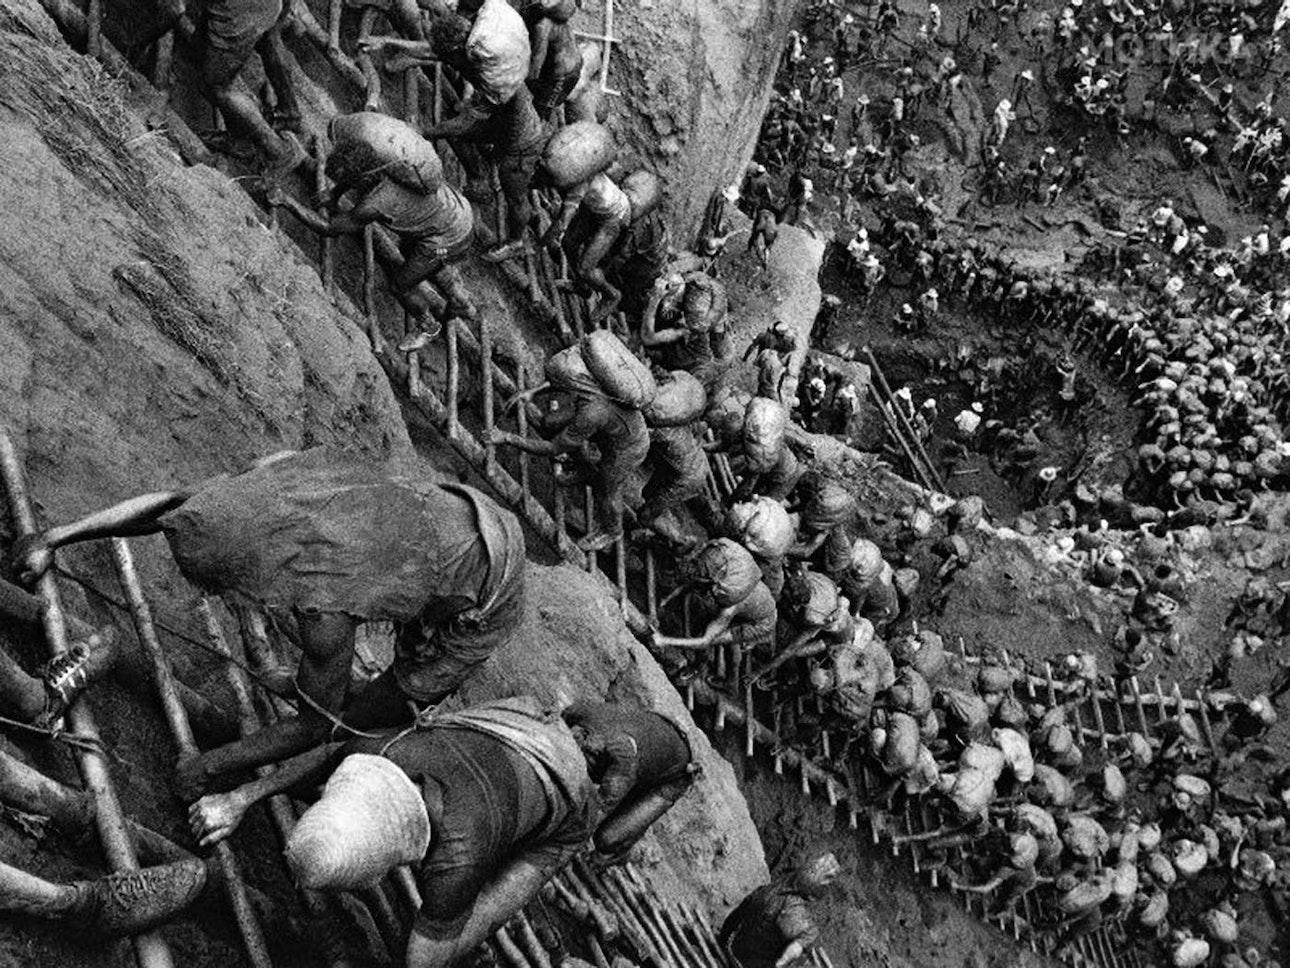 The hell of Sierra Pelada mines, 1980s (10) (2)